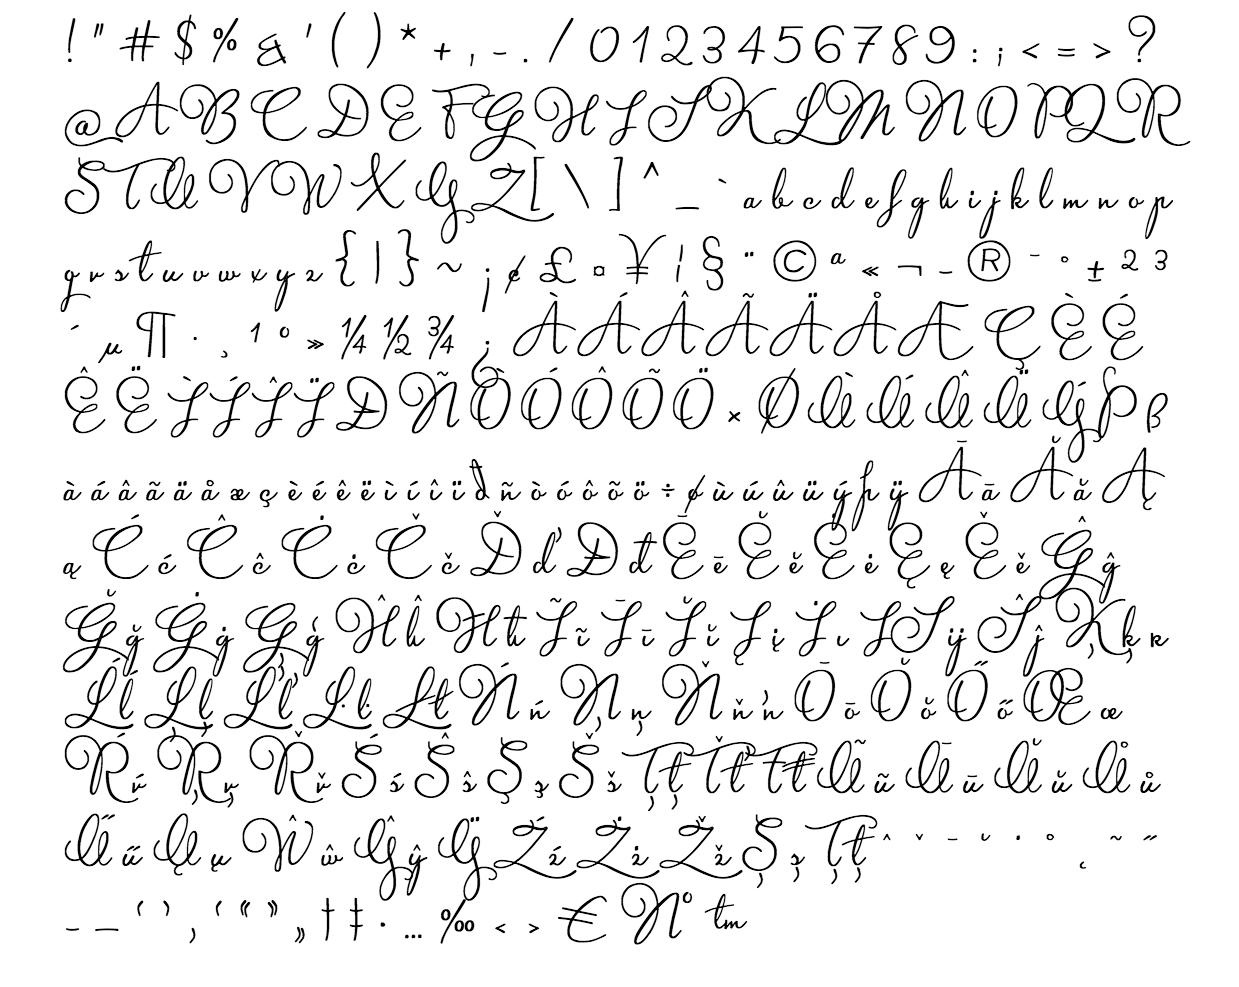 martita font - complete character list